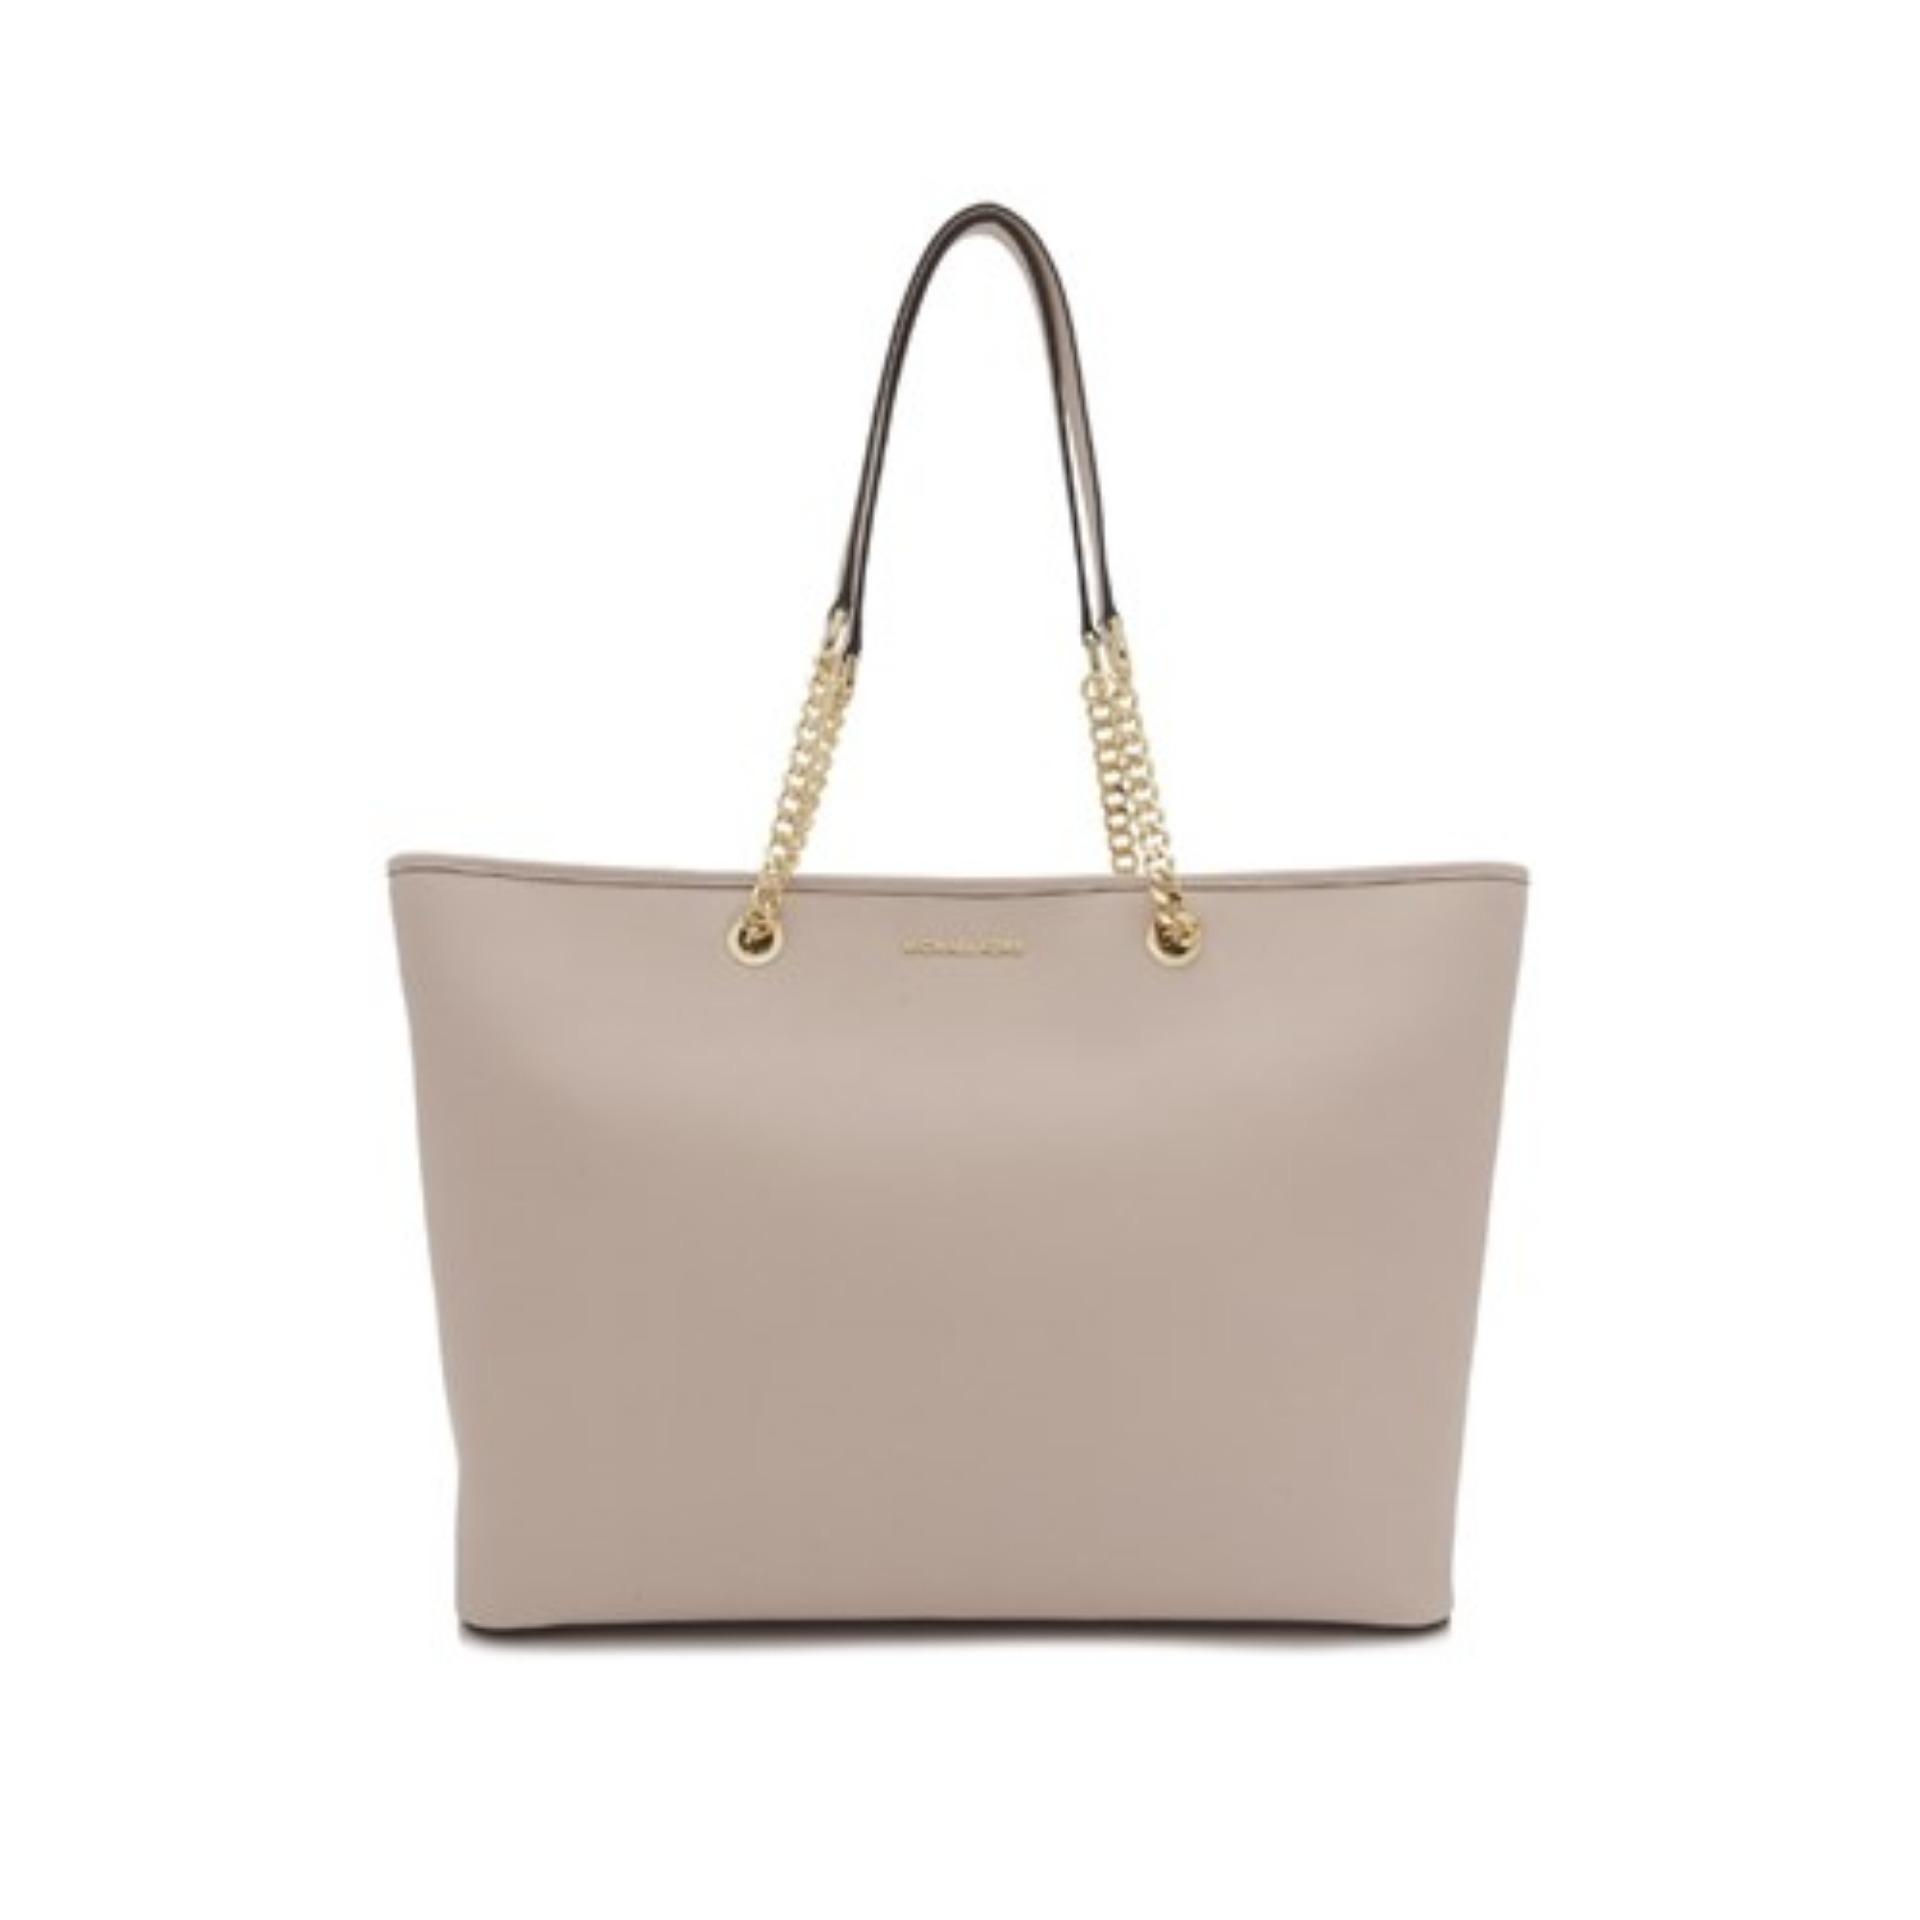 27be8e01a454 Michael Kors Jet Set Travel Chain Medium Top Zip Multi Functional Tote Bag  (Soft Pink